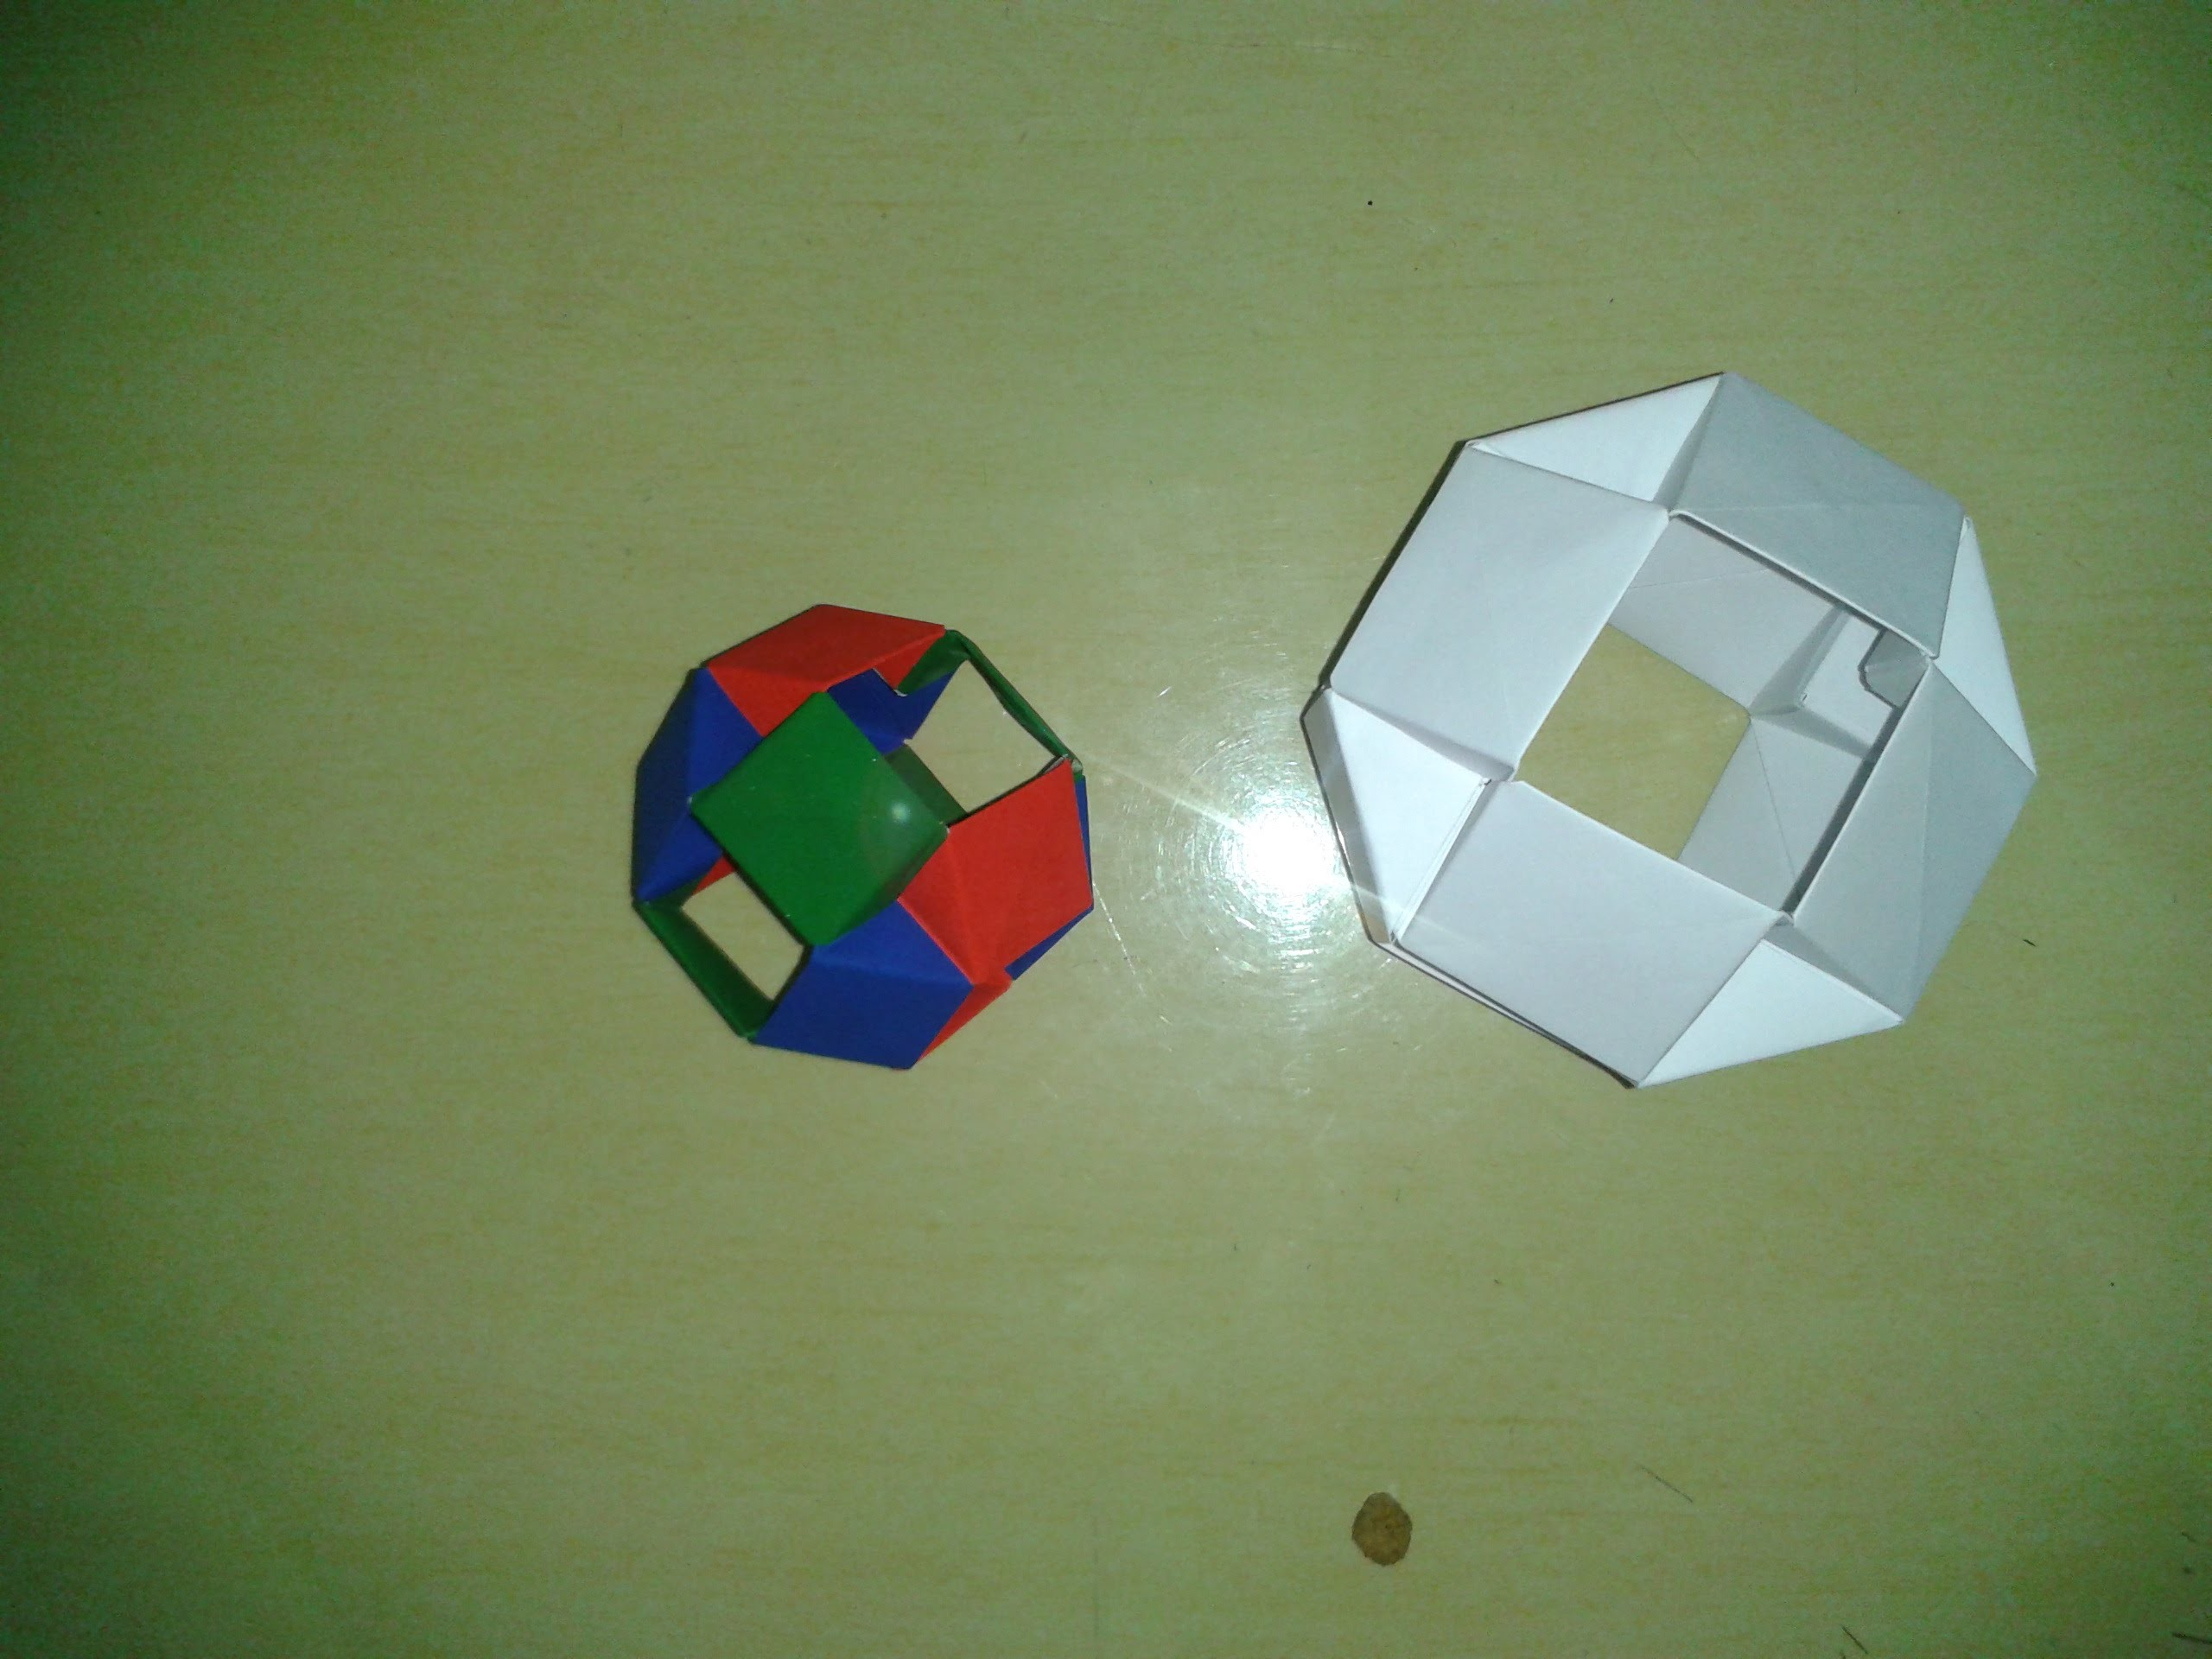 Origami Modular Sonobe Plane - Time-lapse